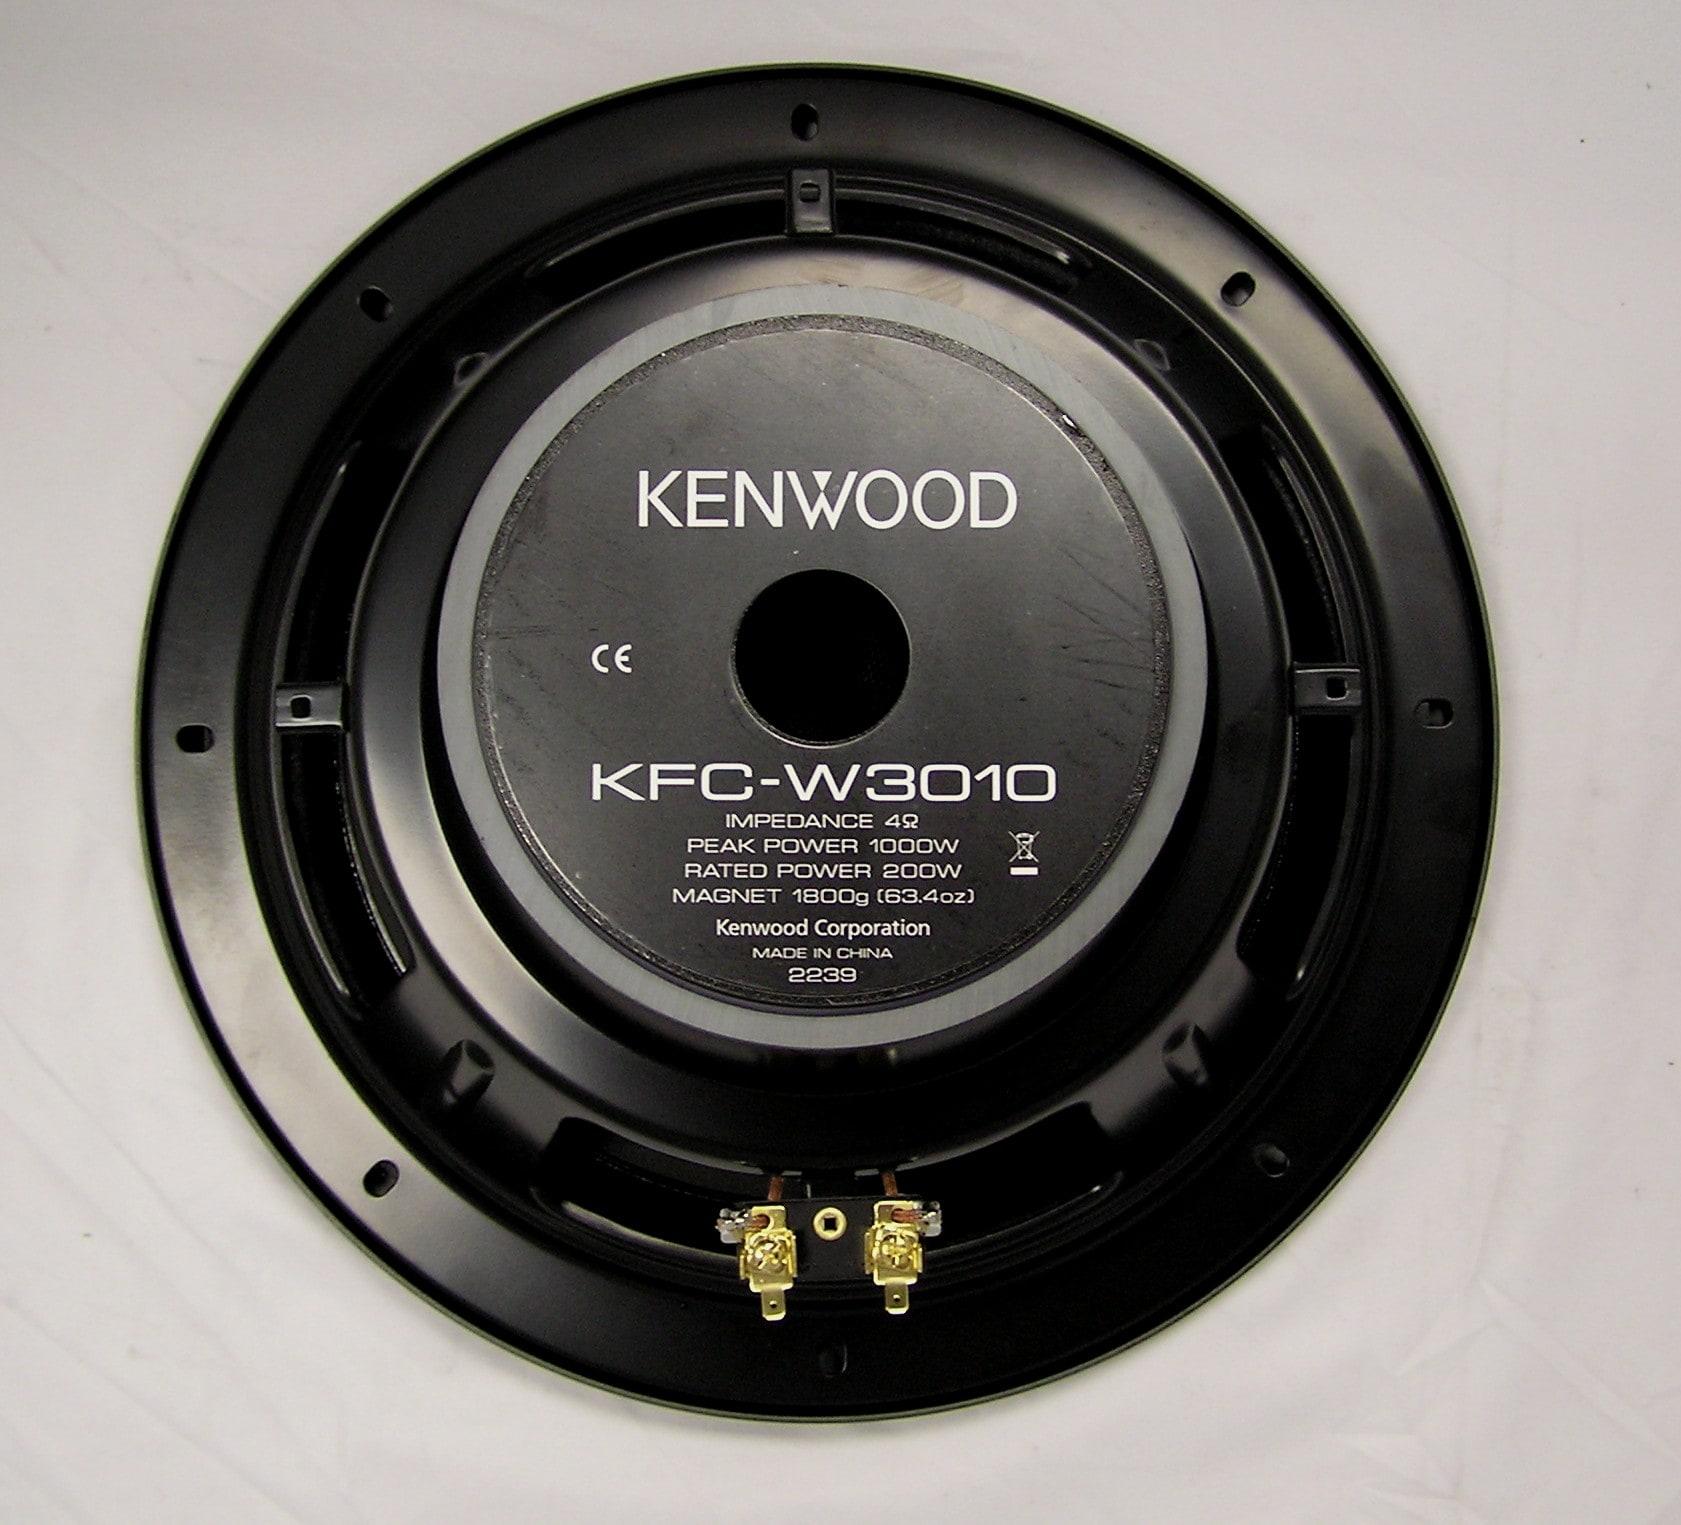 Kenwood KFC-W3010 12-inch 1000-watt Subwoofer